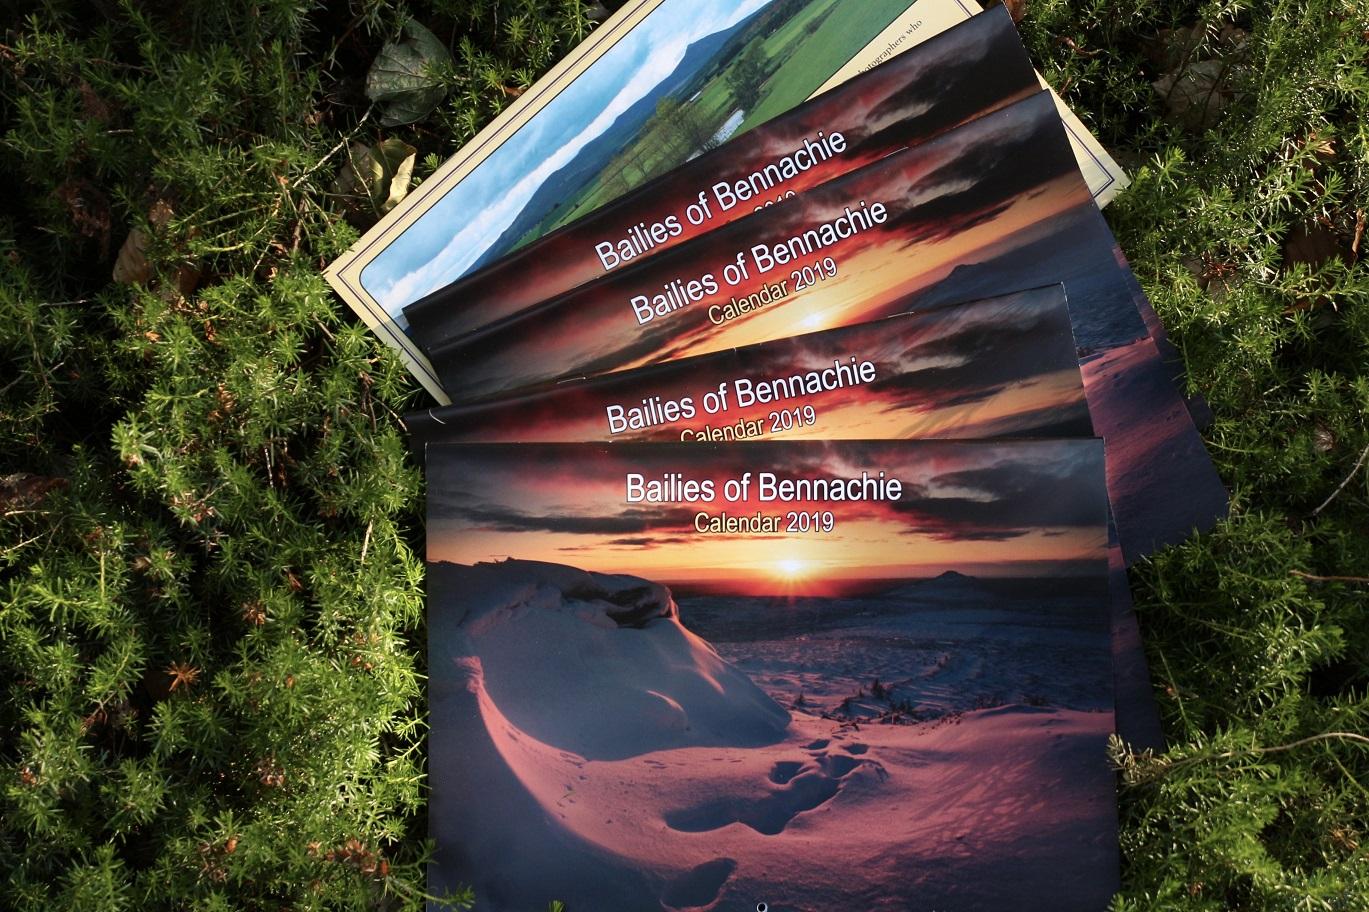 Bailies of Bennachie 2019 Calendar